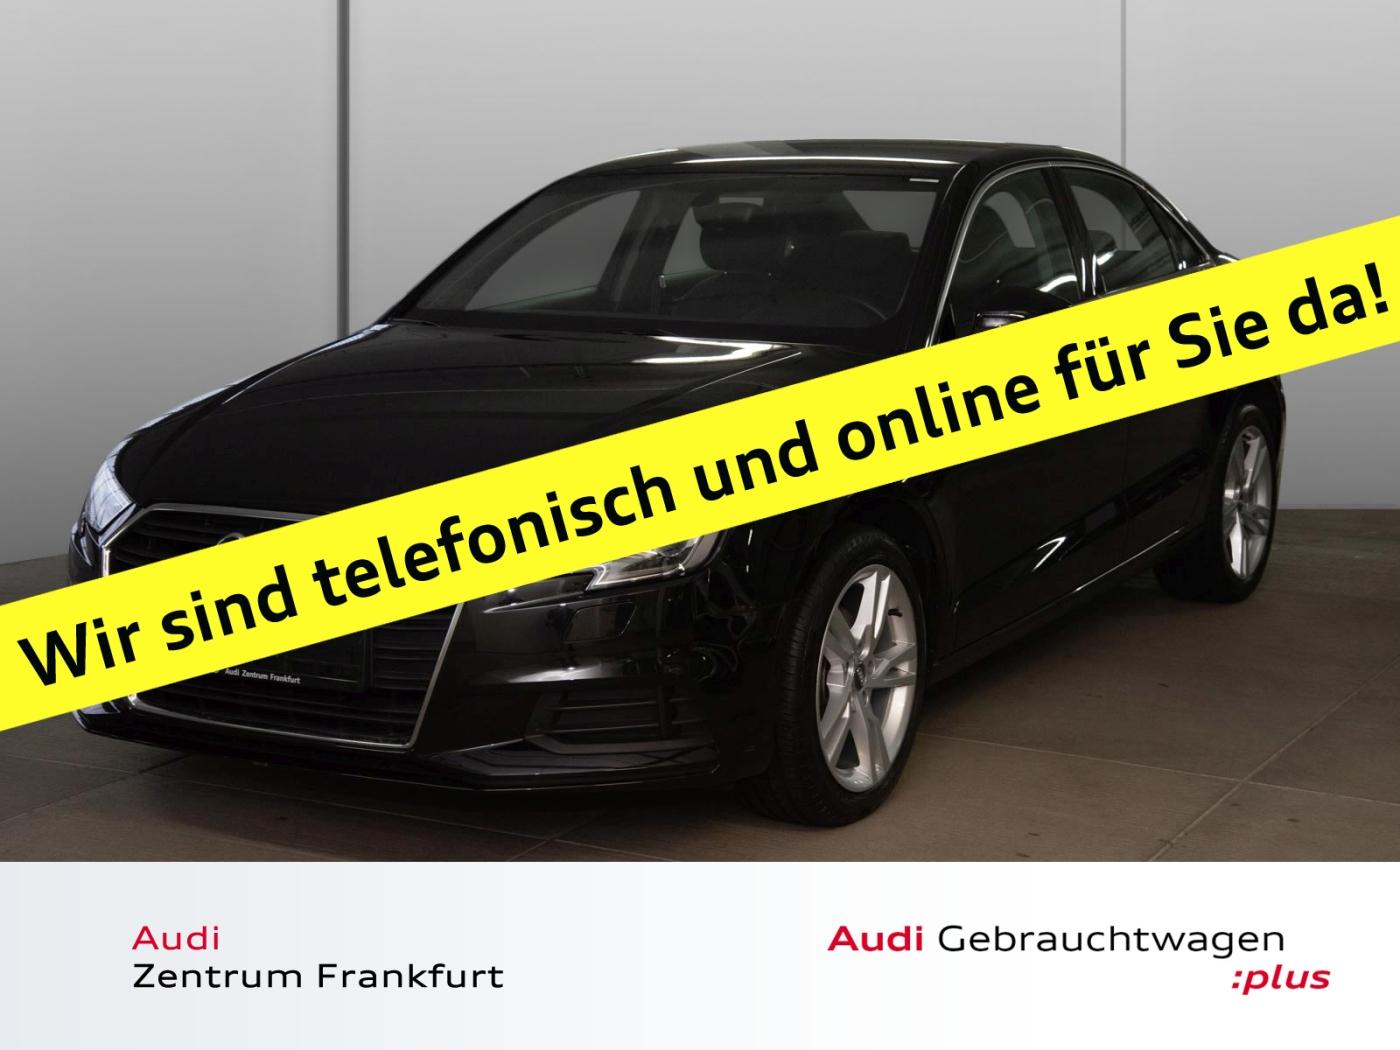 Audi A3 Limousine 30 TFSI Xenon Tempomat PDC Sitzheiz, Jahr 2018, Benzin